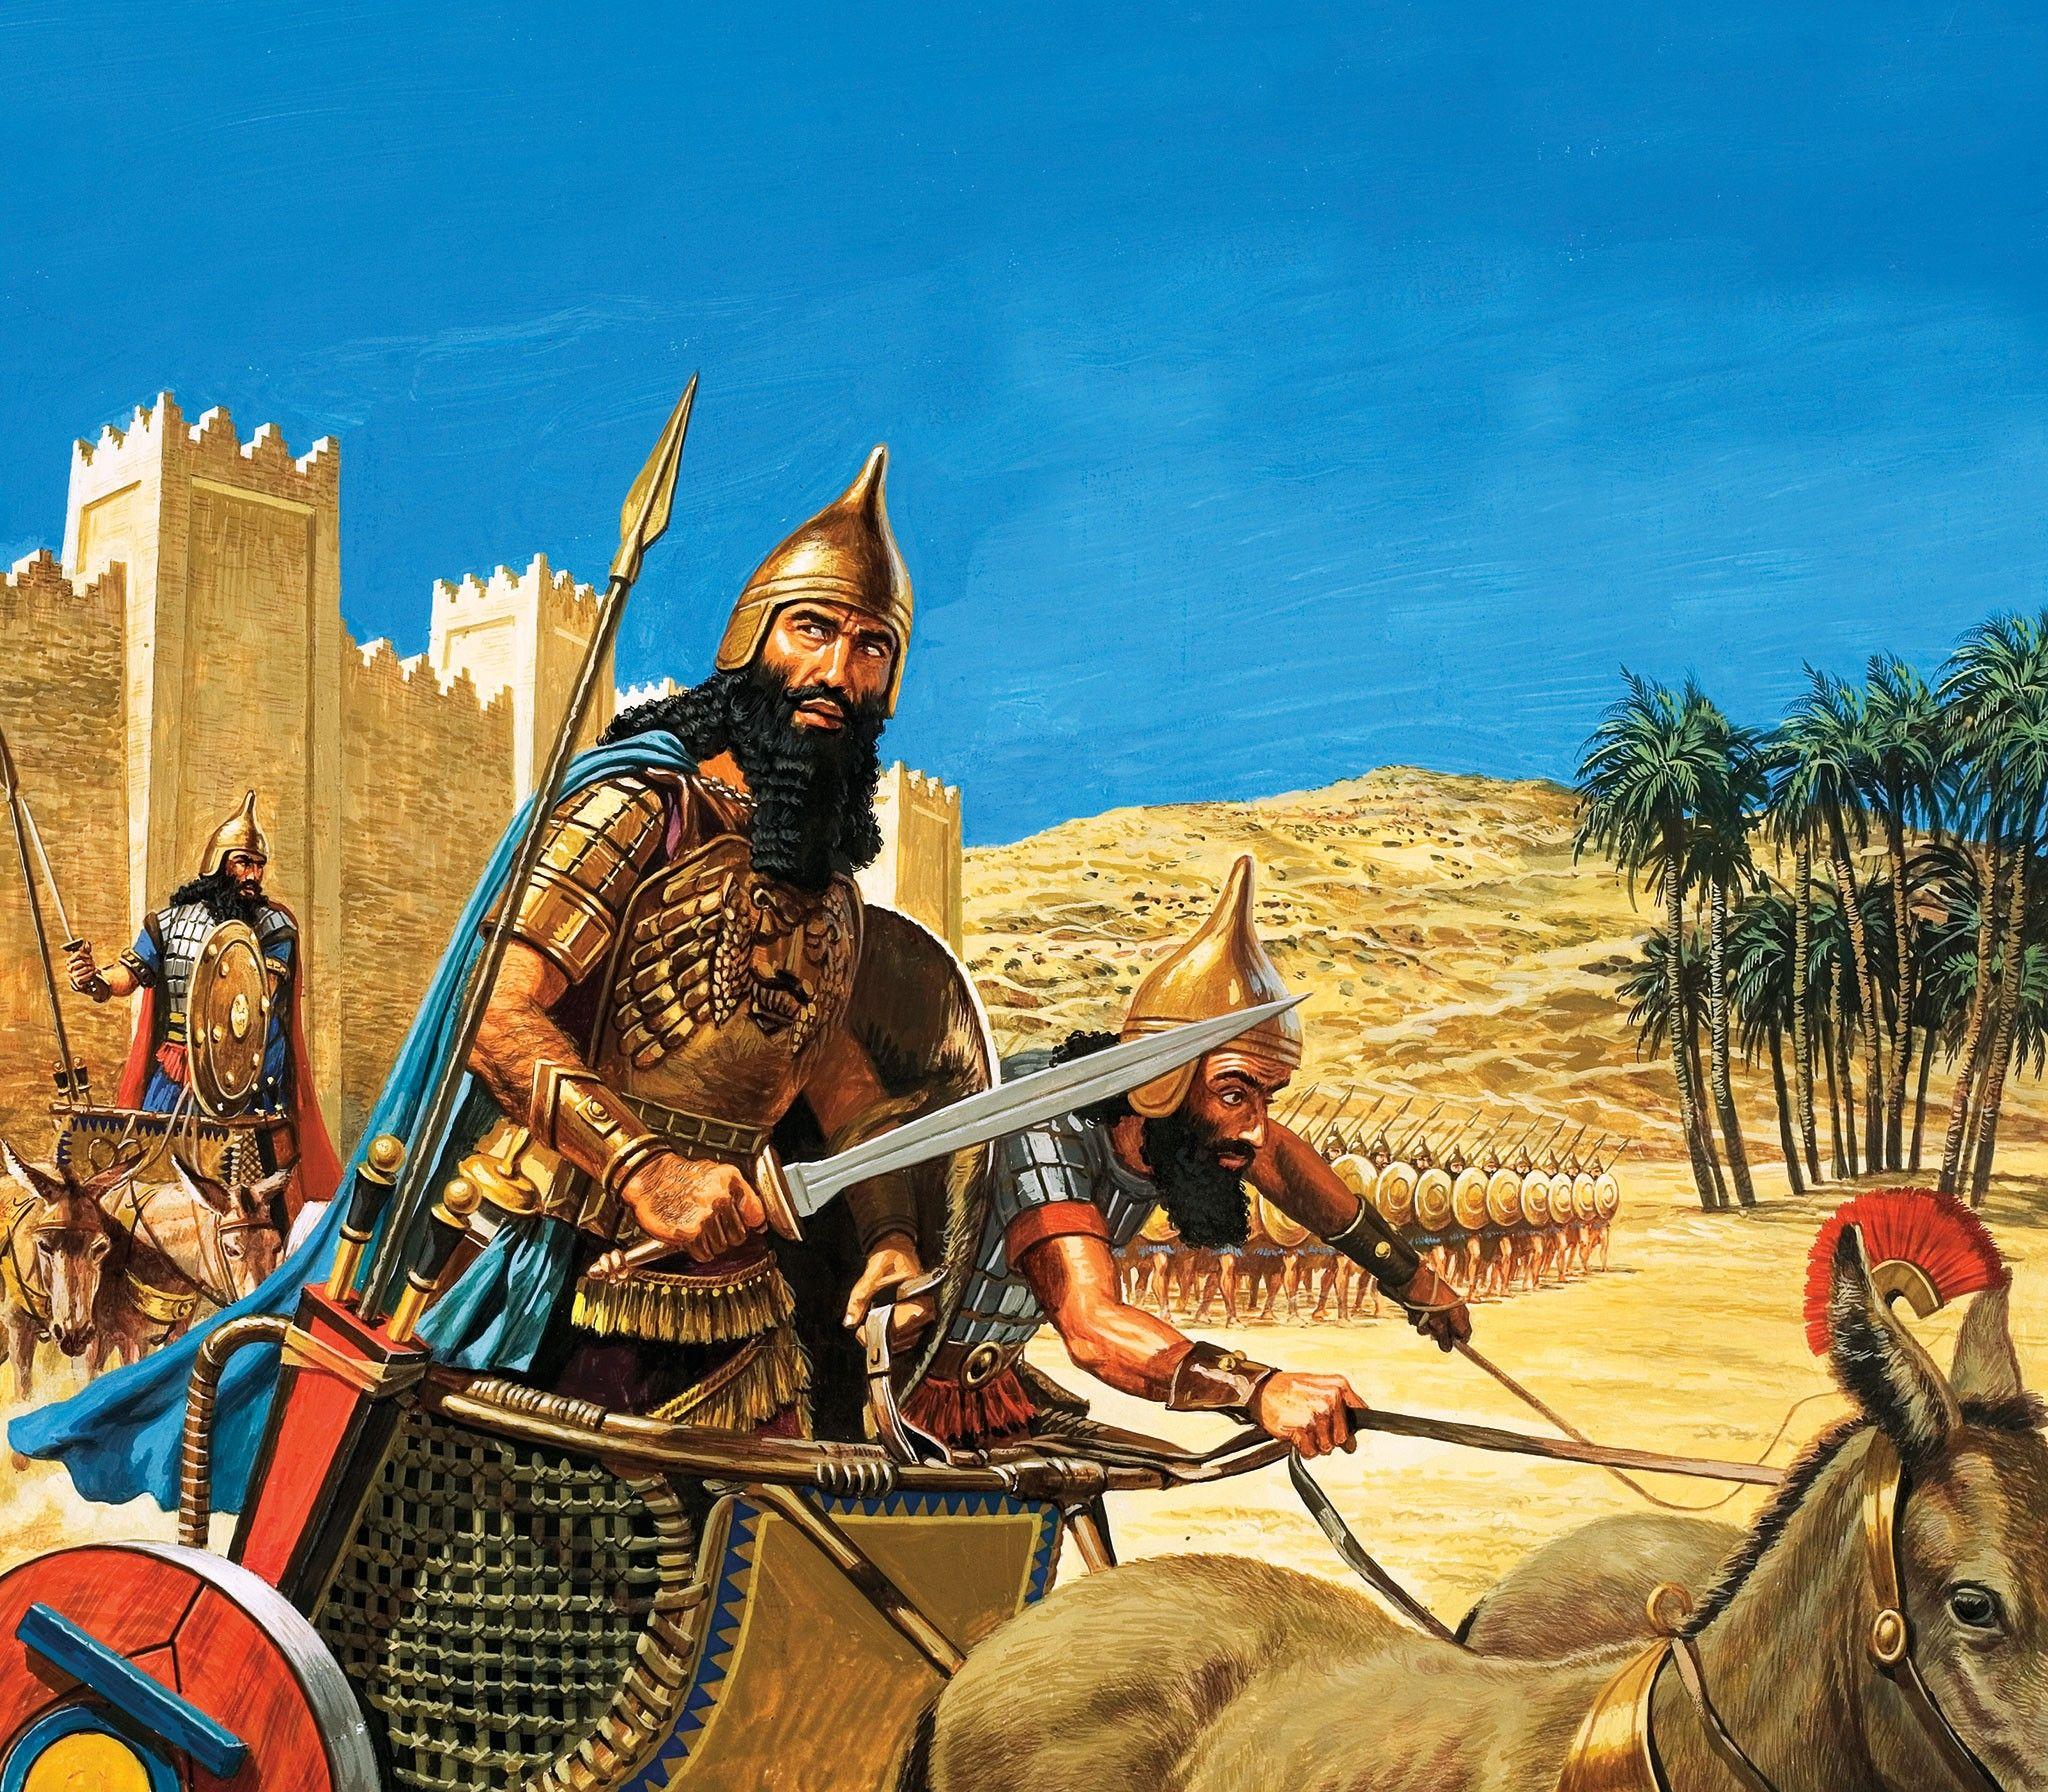 Wer war Hammurabi? | National Geographic